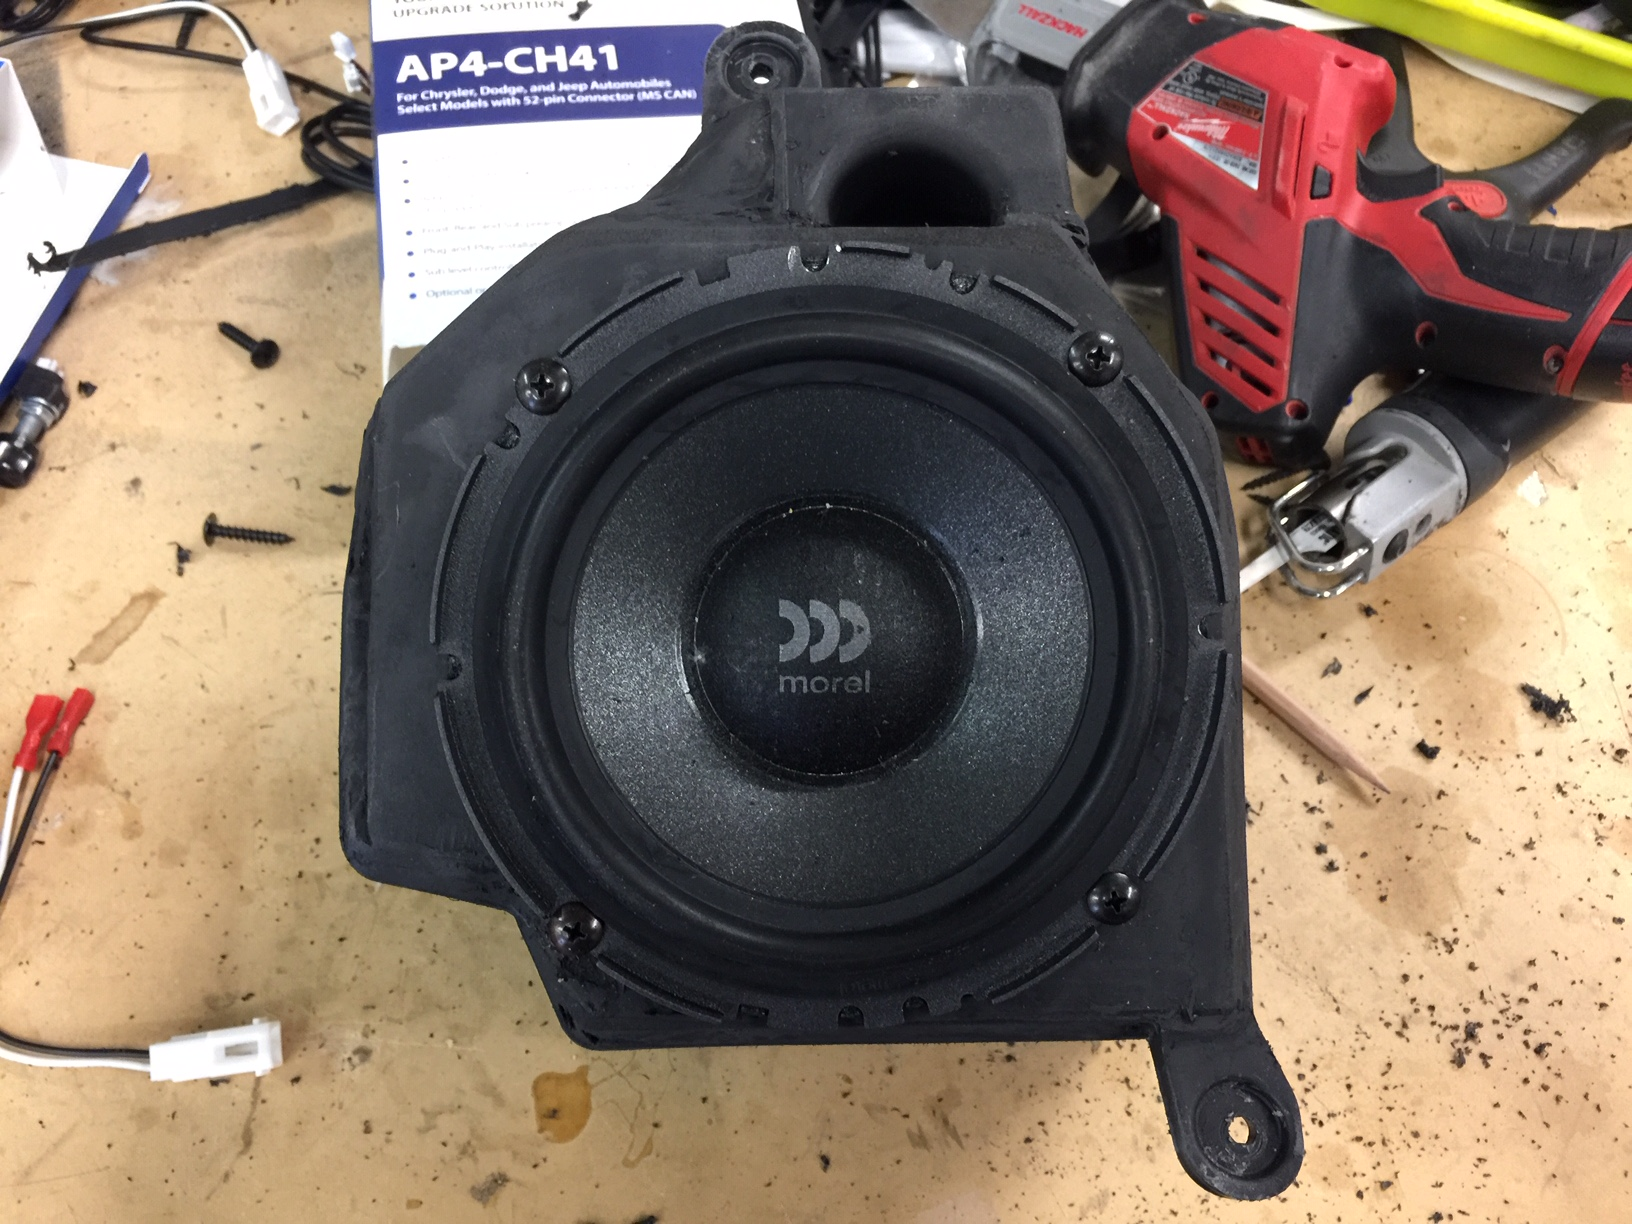 Jeep Wrangler JLU Stereo Upgrade - Modified speaker enclosure final